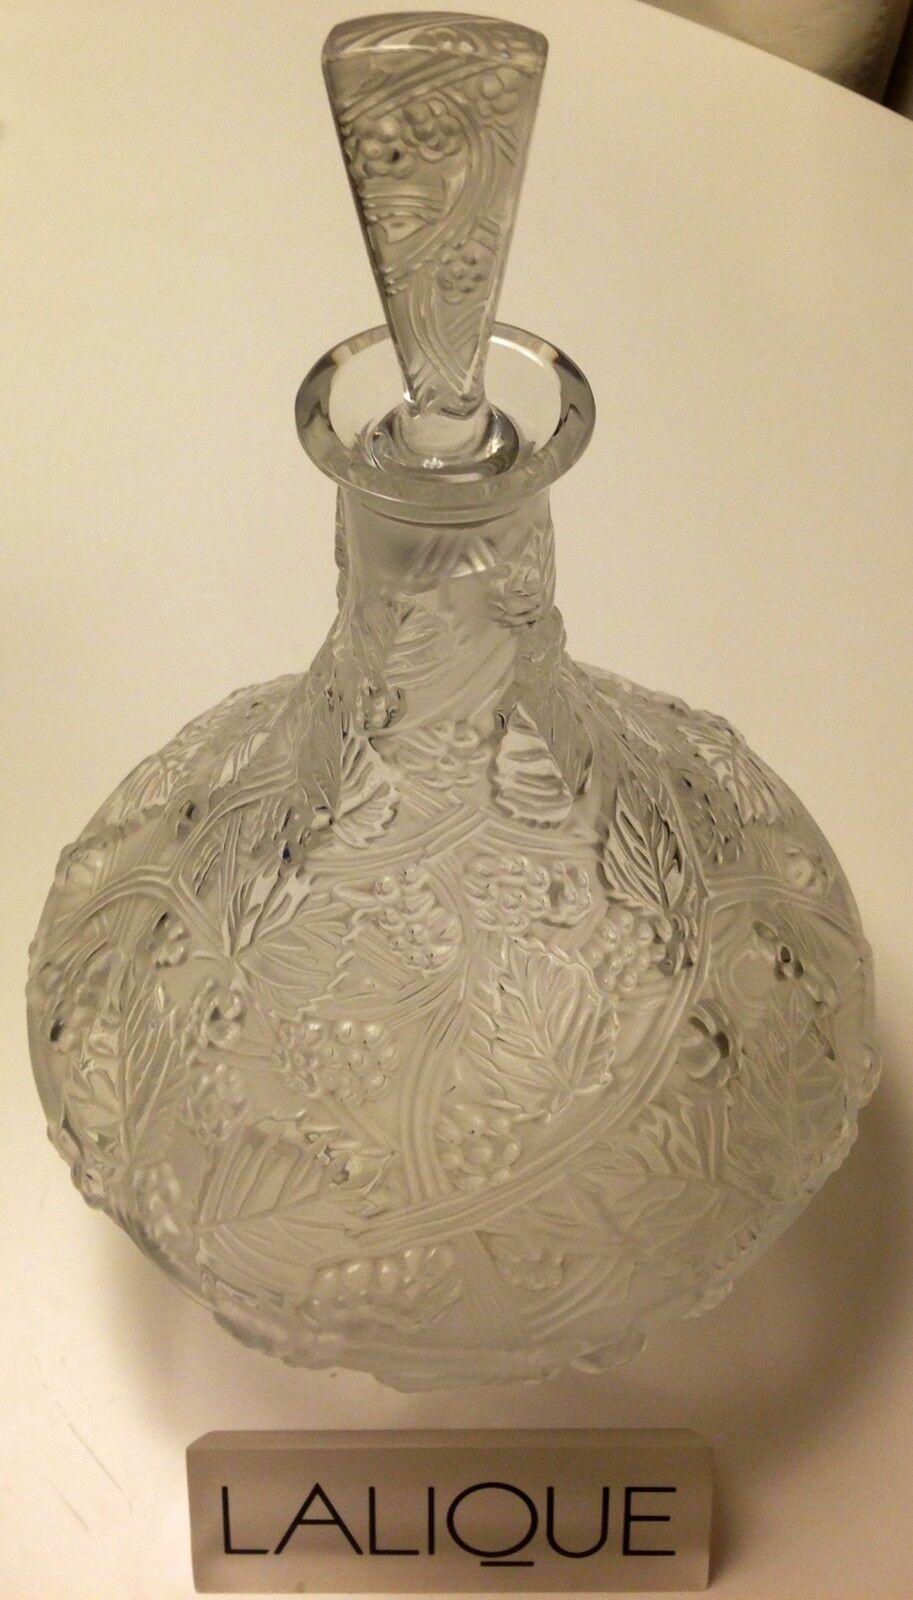 Jarra Mures - Decantador Mures - Jarra Mures - Botella Mures - Lalique